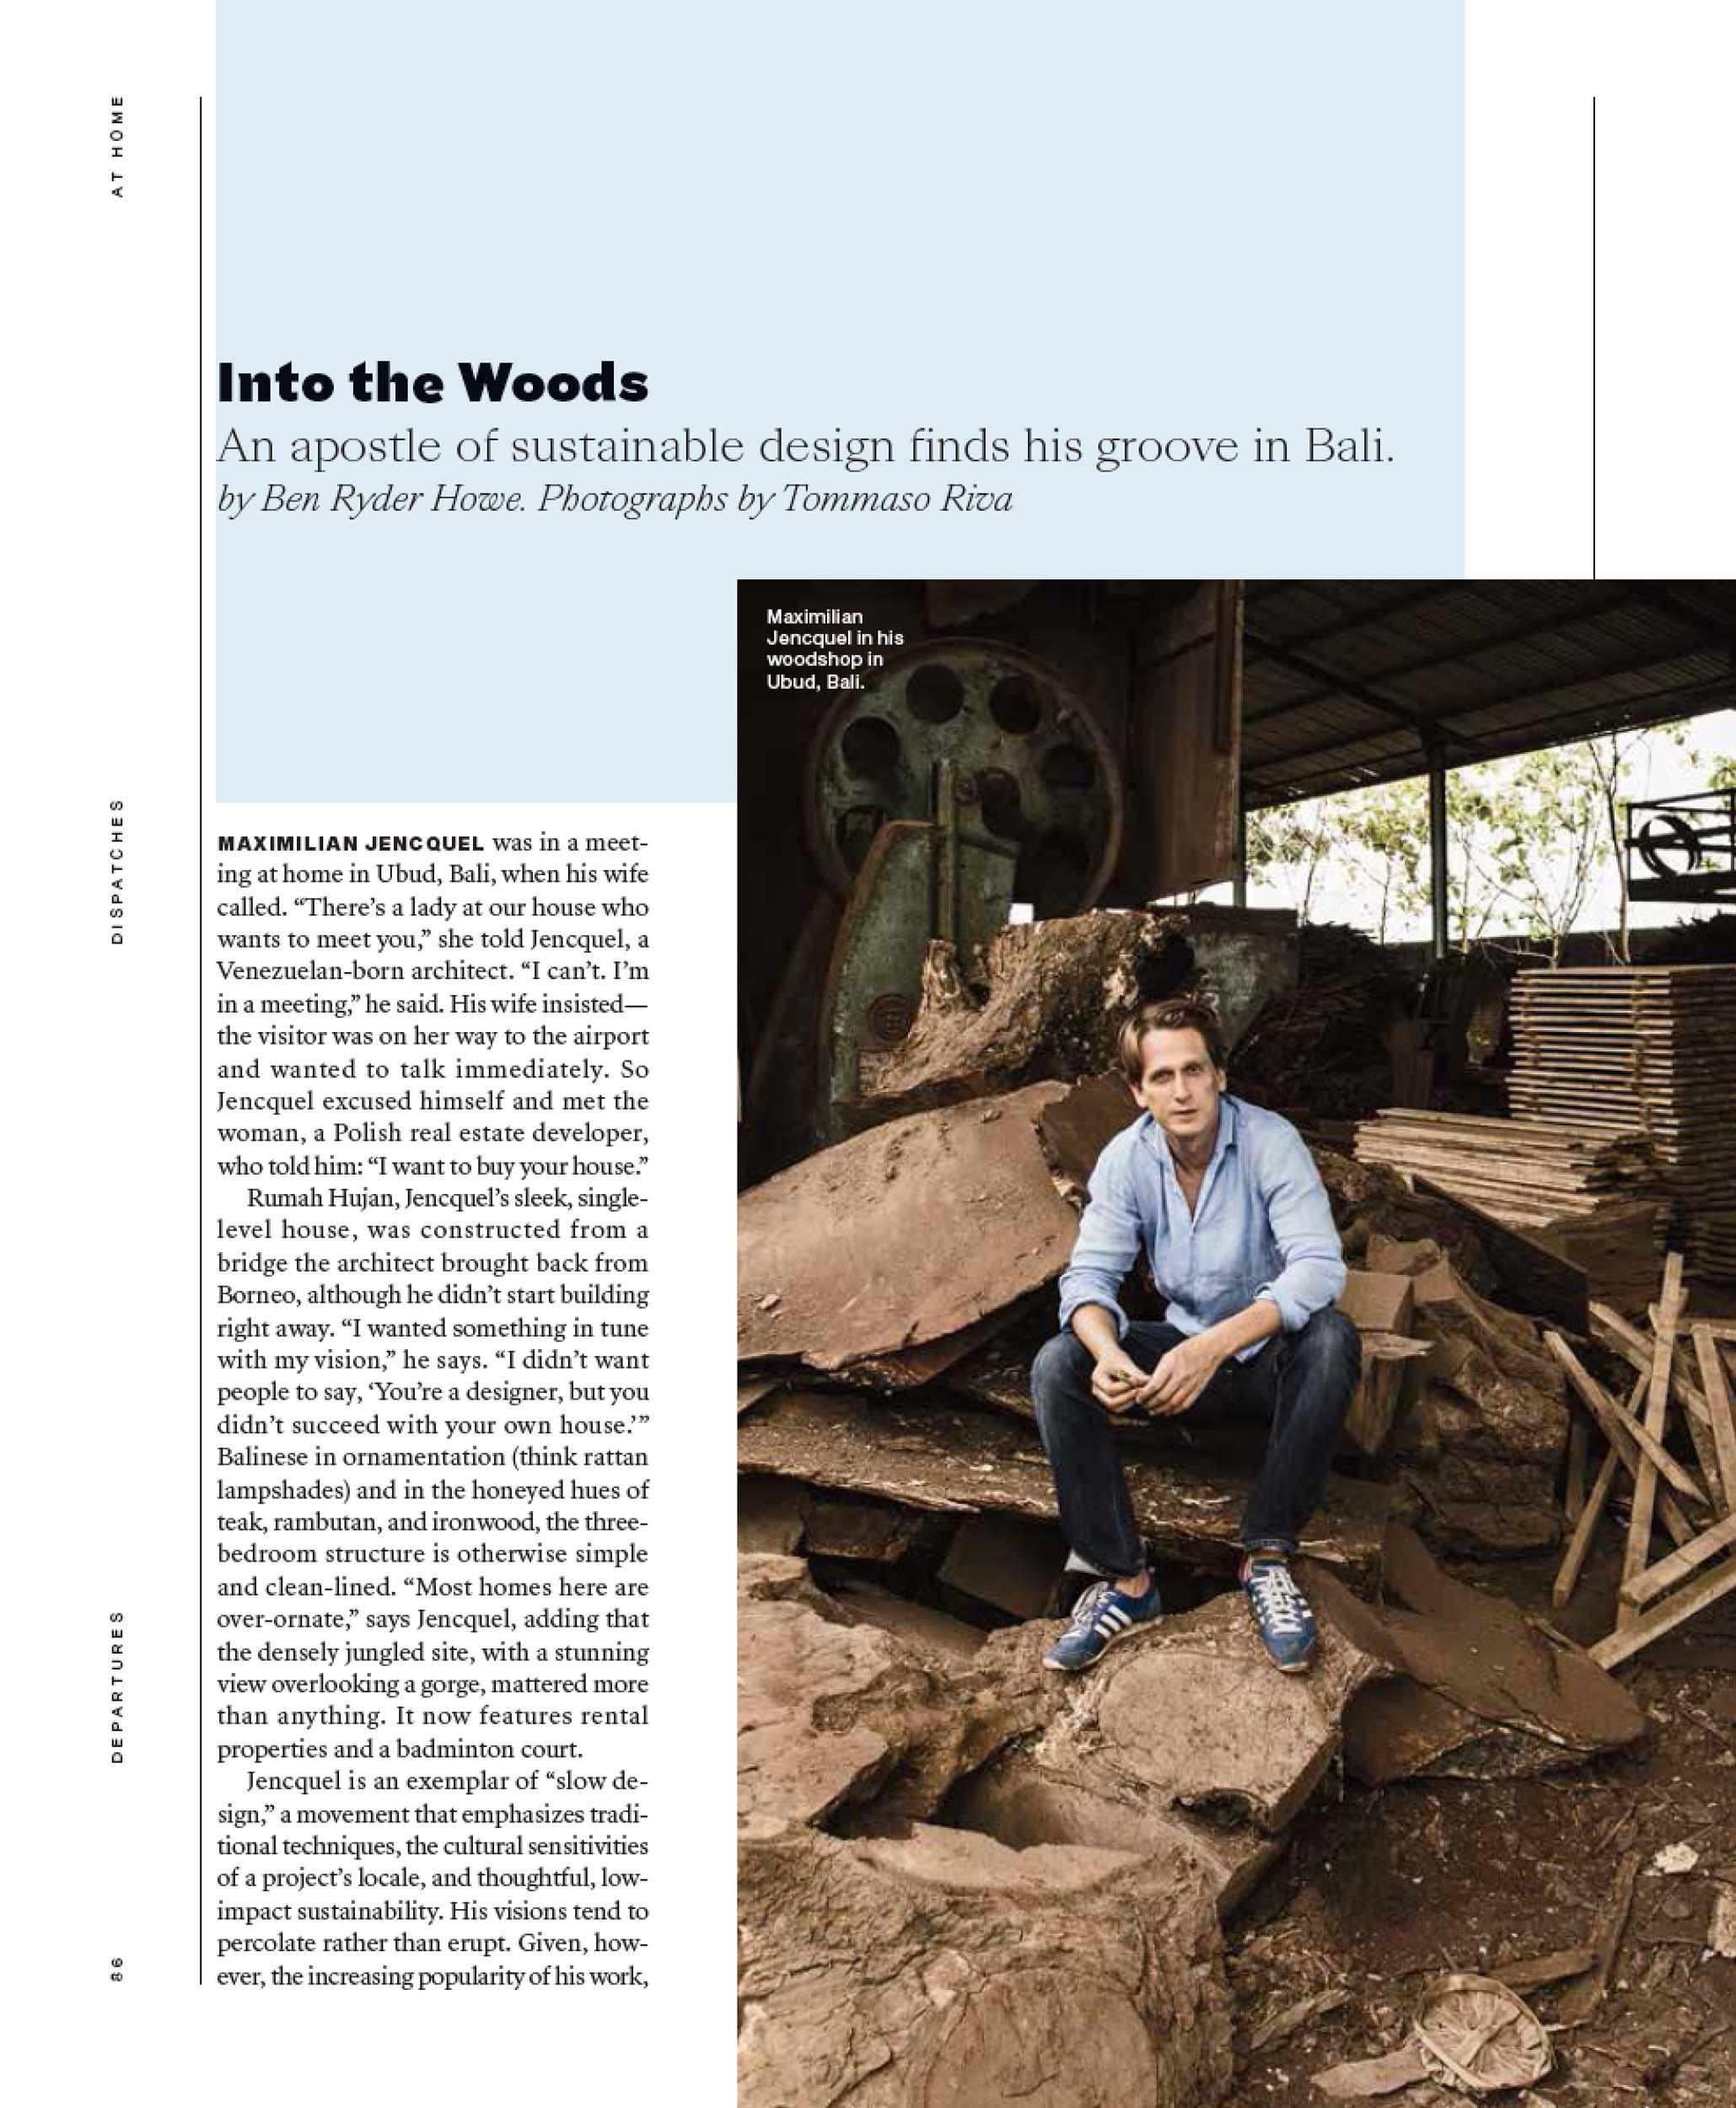 departures-magazine-maximilian-jenquel-bali-tommaso-riva-lisa-scappin-interiors-bamboo (2 of 4).jpg